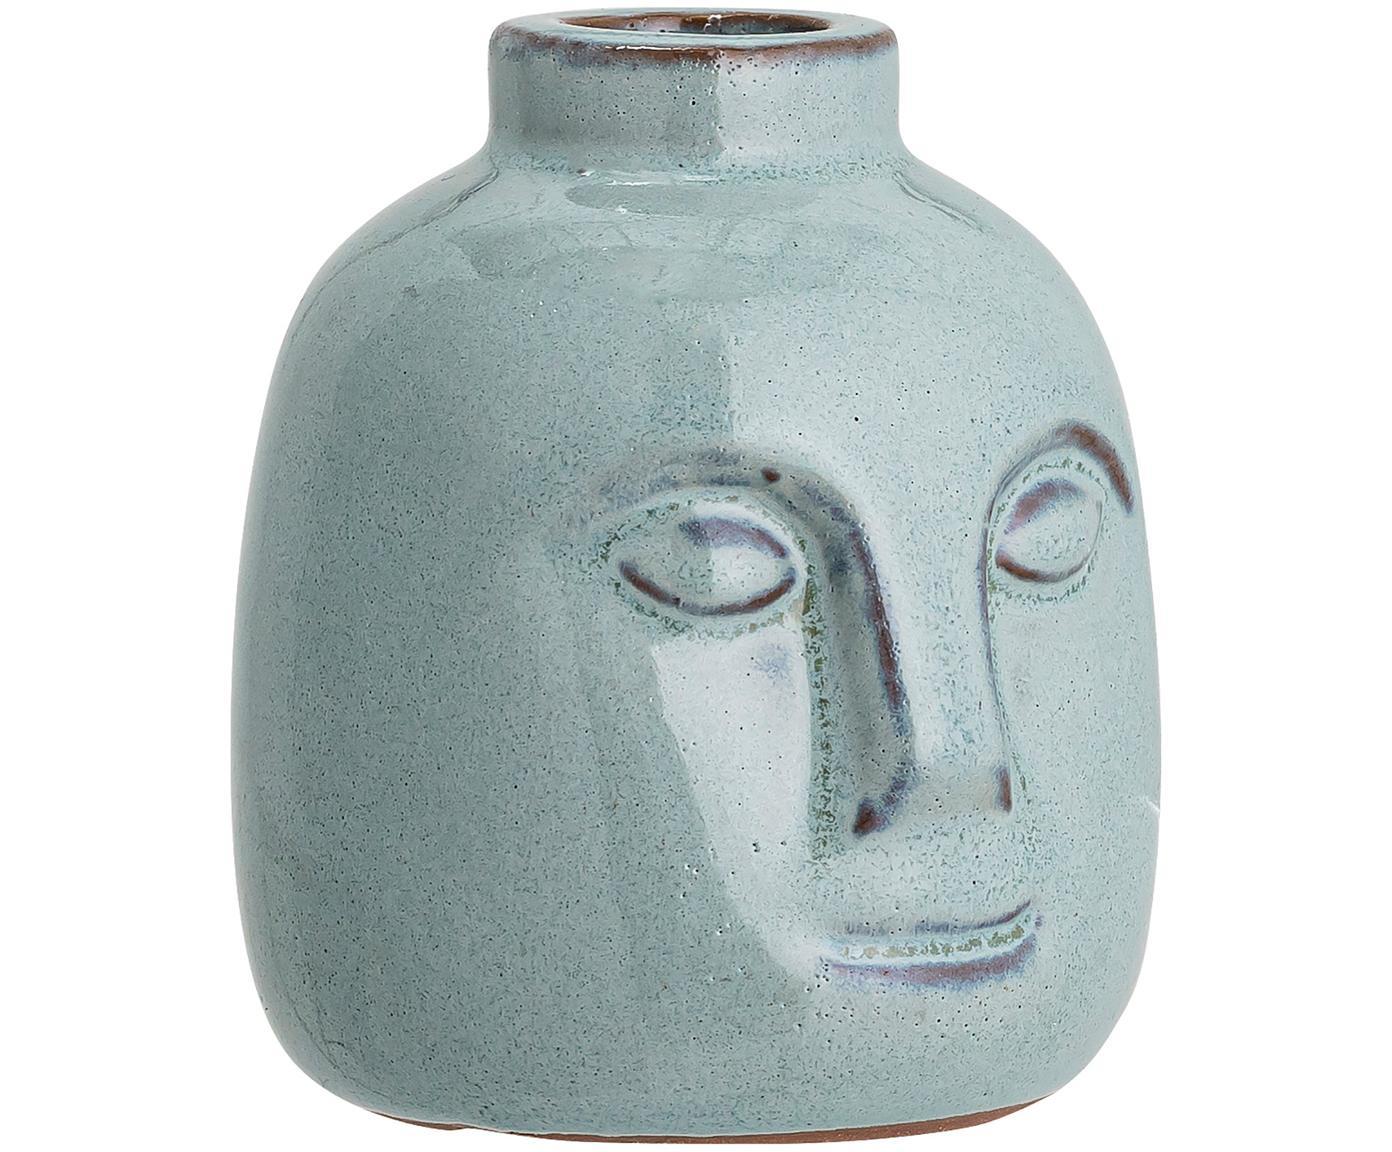 Candelabro fatto a mano Brit, Terracotta, Blu, Ø 9 x Alt. 9 cm